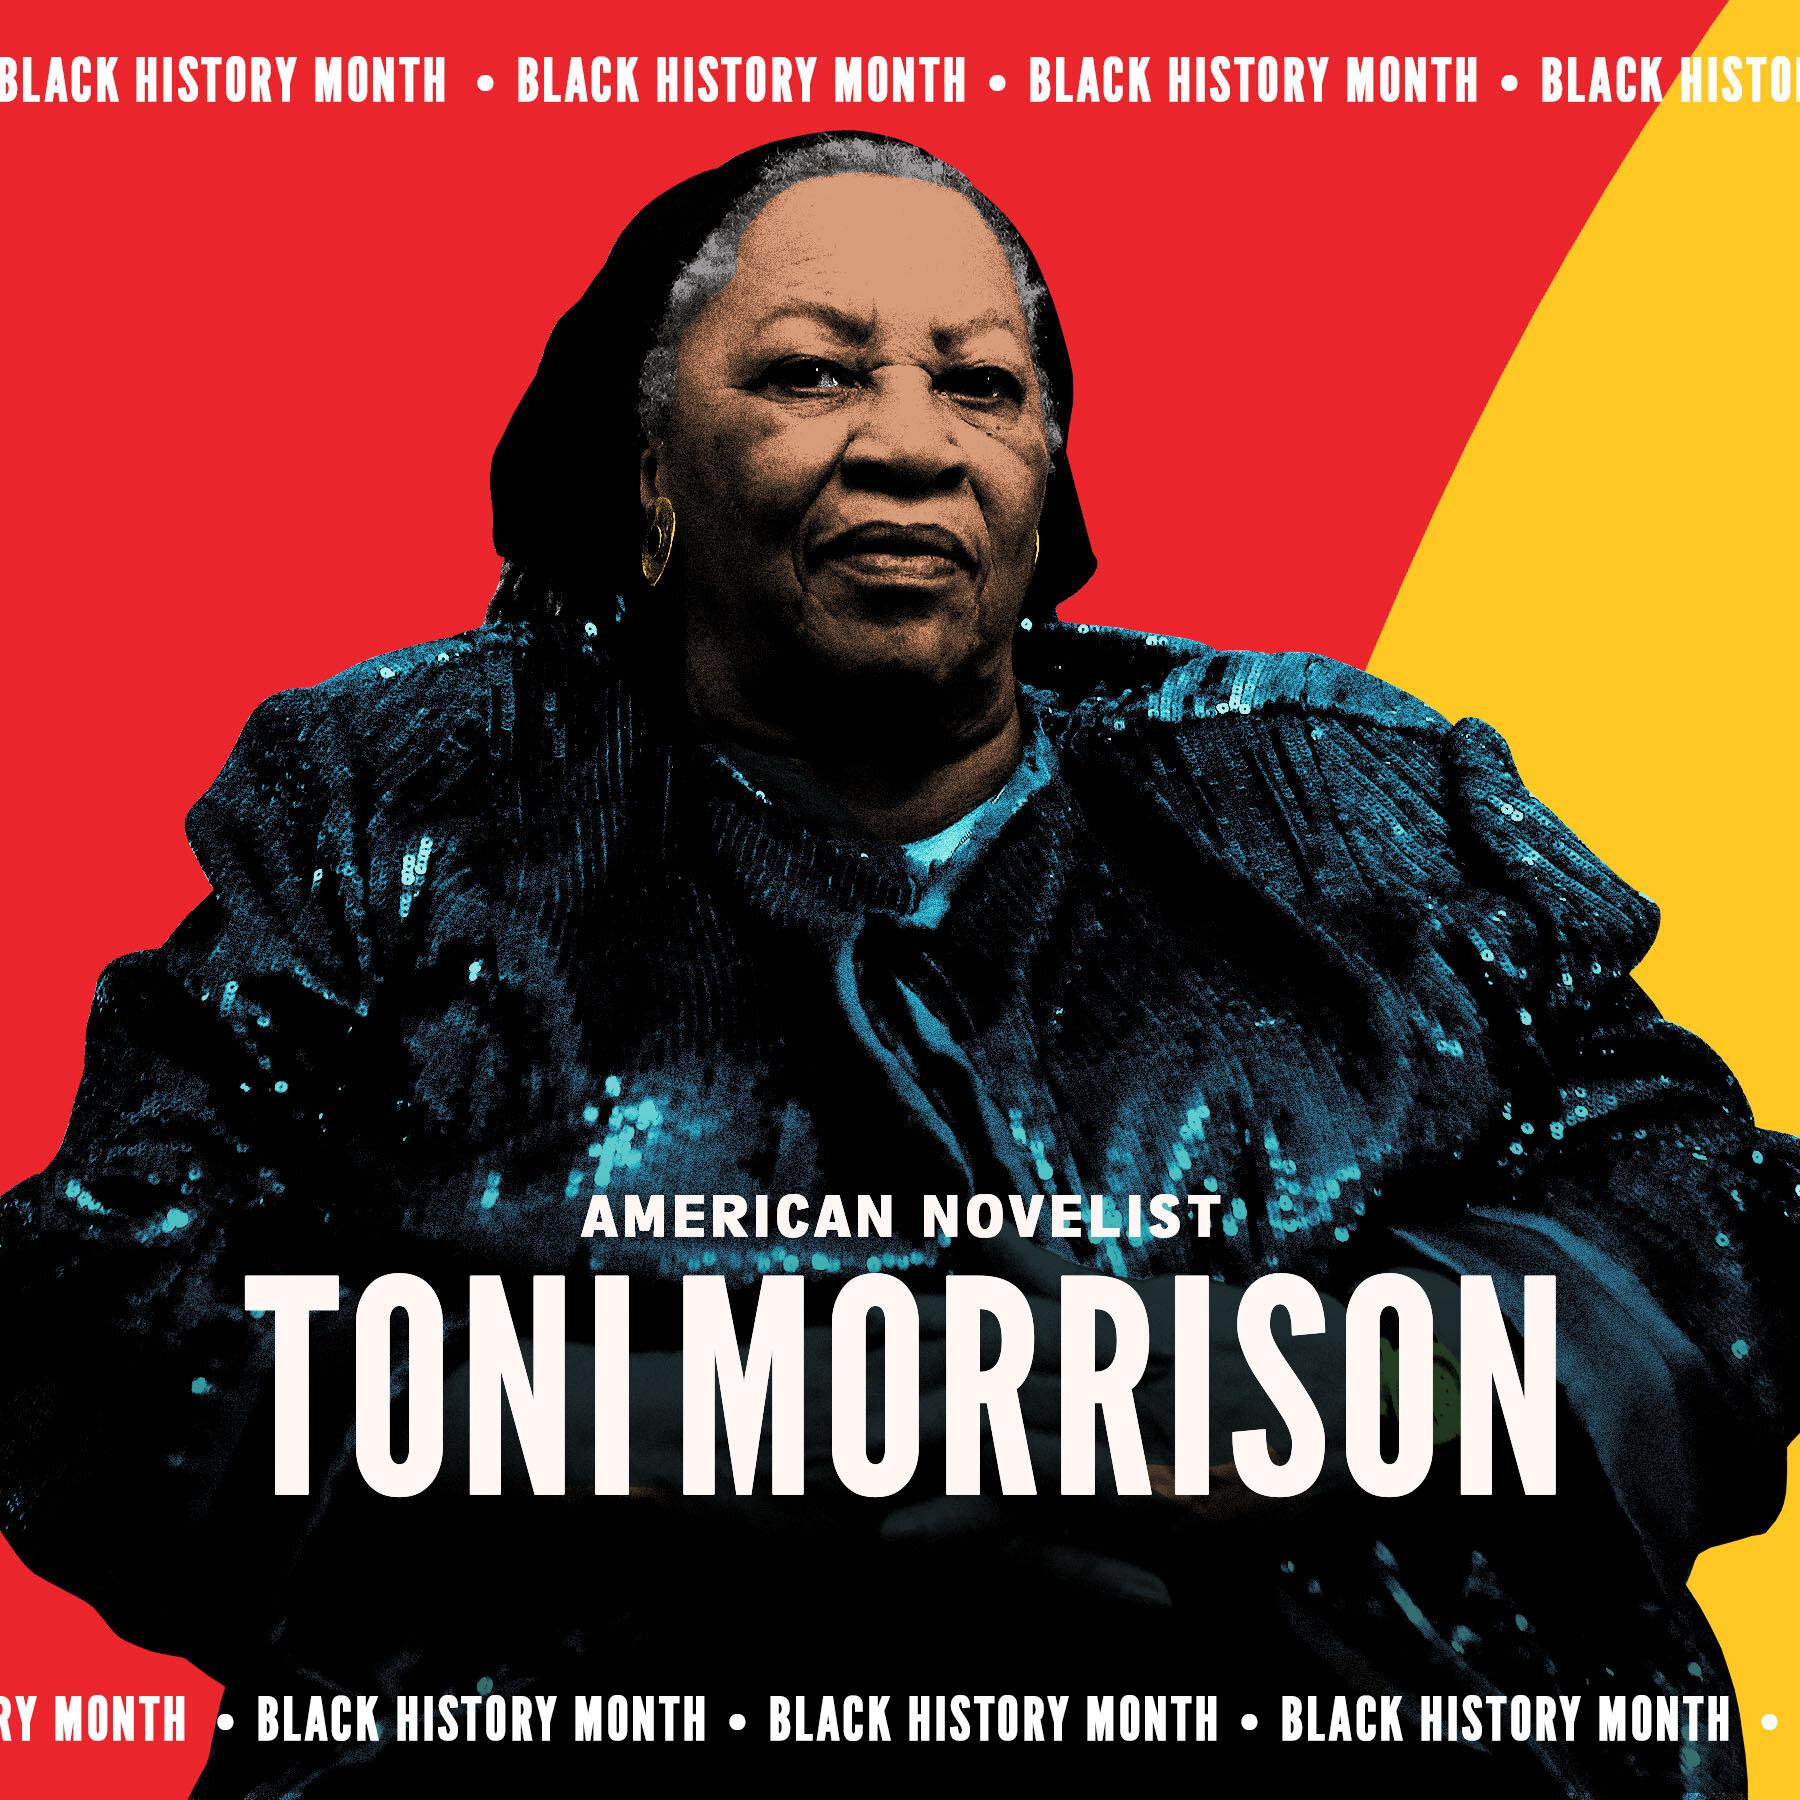 LS_BlackHistoryMonth_V3Toni Morrison_F1V1.jpg